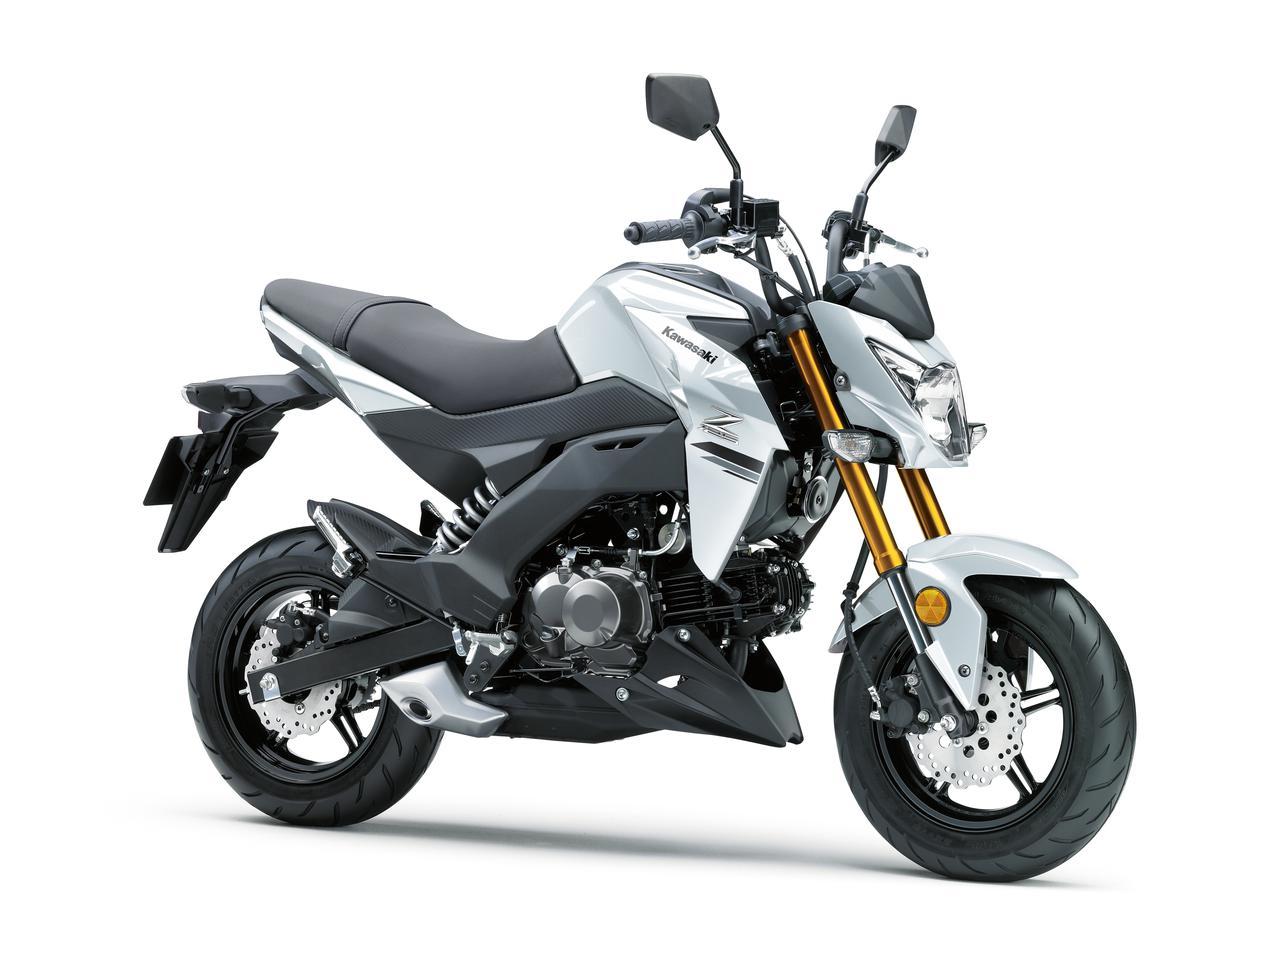 Images : 5番目の画像 - Z125 PROの写真を全て見る - LAWRENCE - Motorcycle x Cars + α = Your Life.